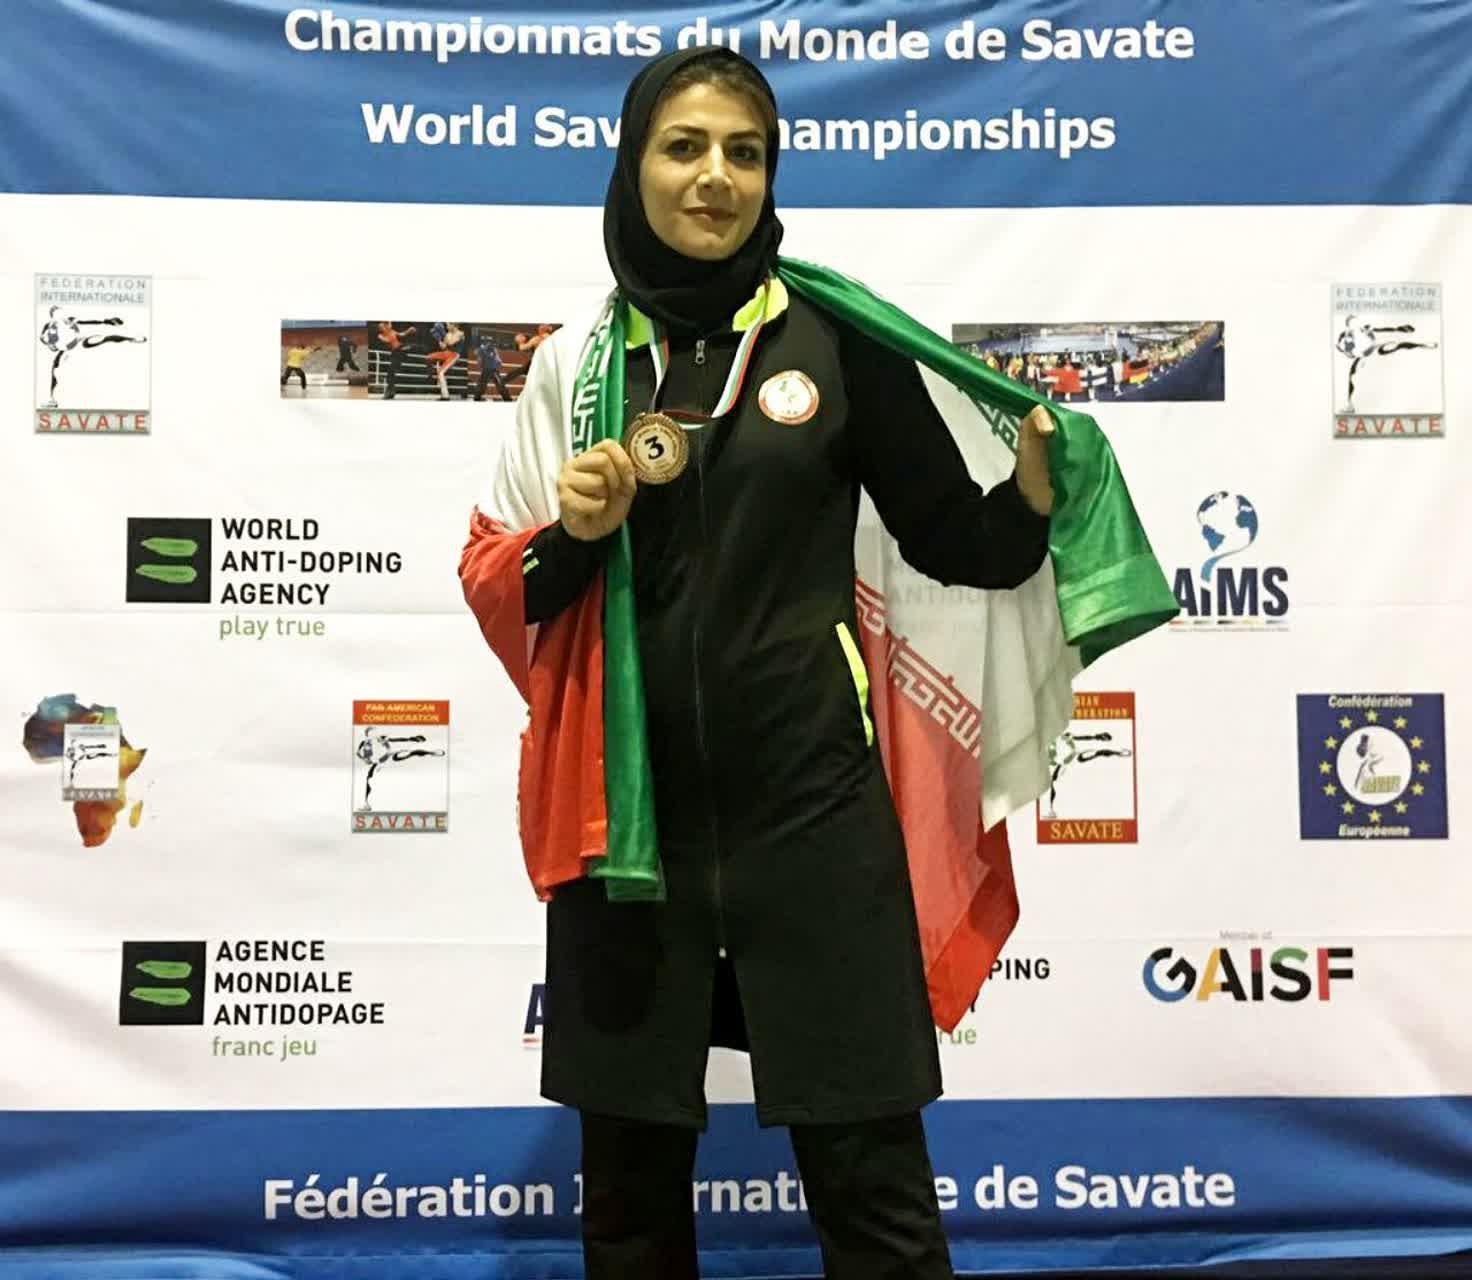 ساواته کار کرمانی بر سکوی سوم مسابقات جهانی بلغارستان